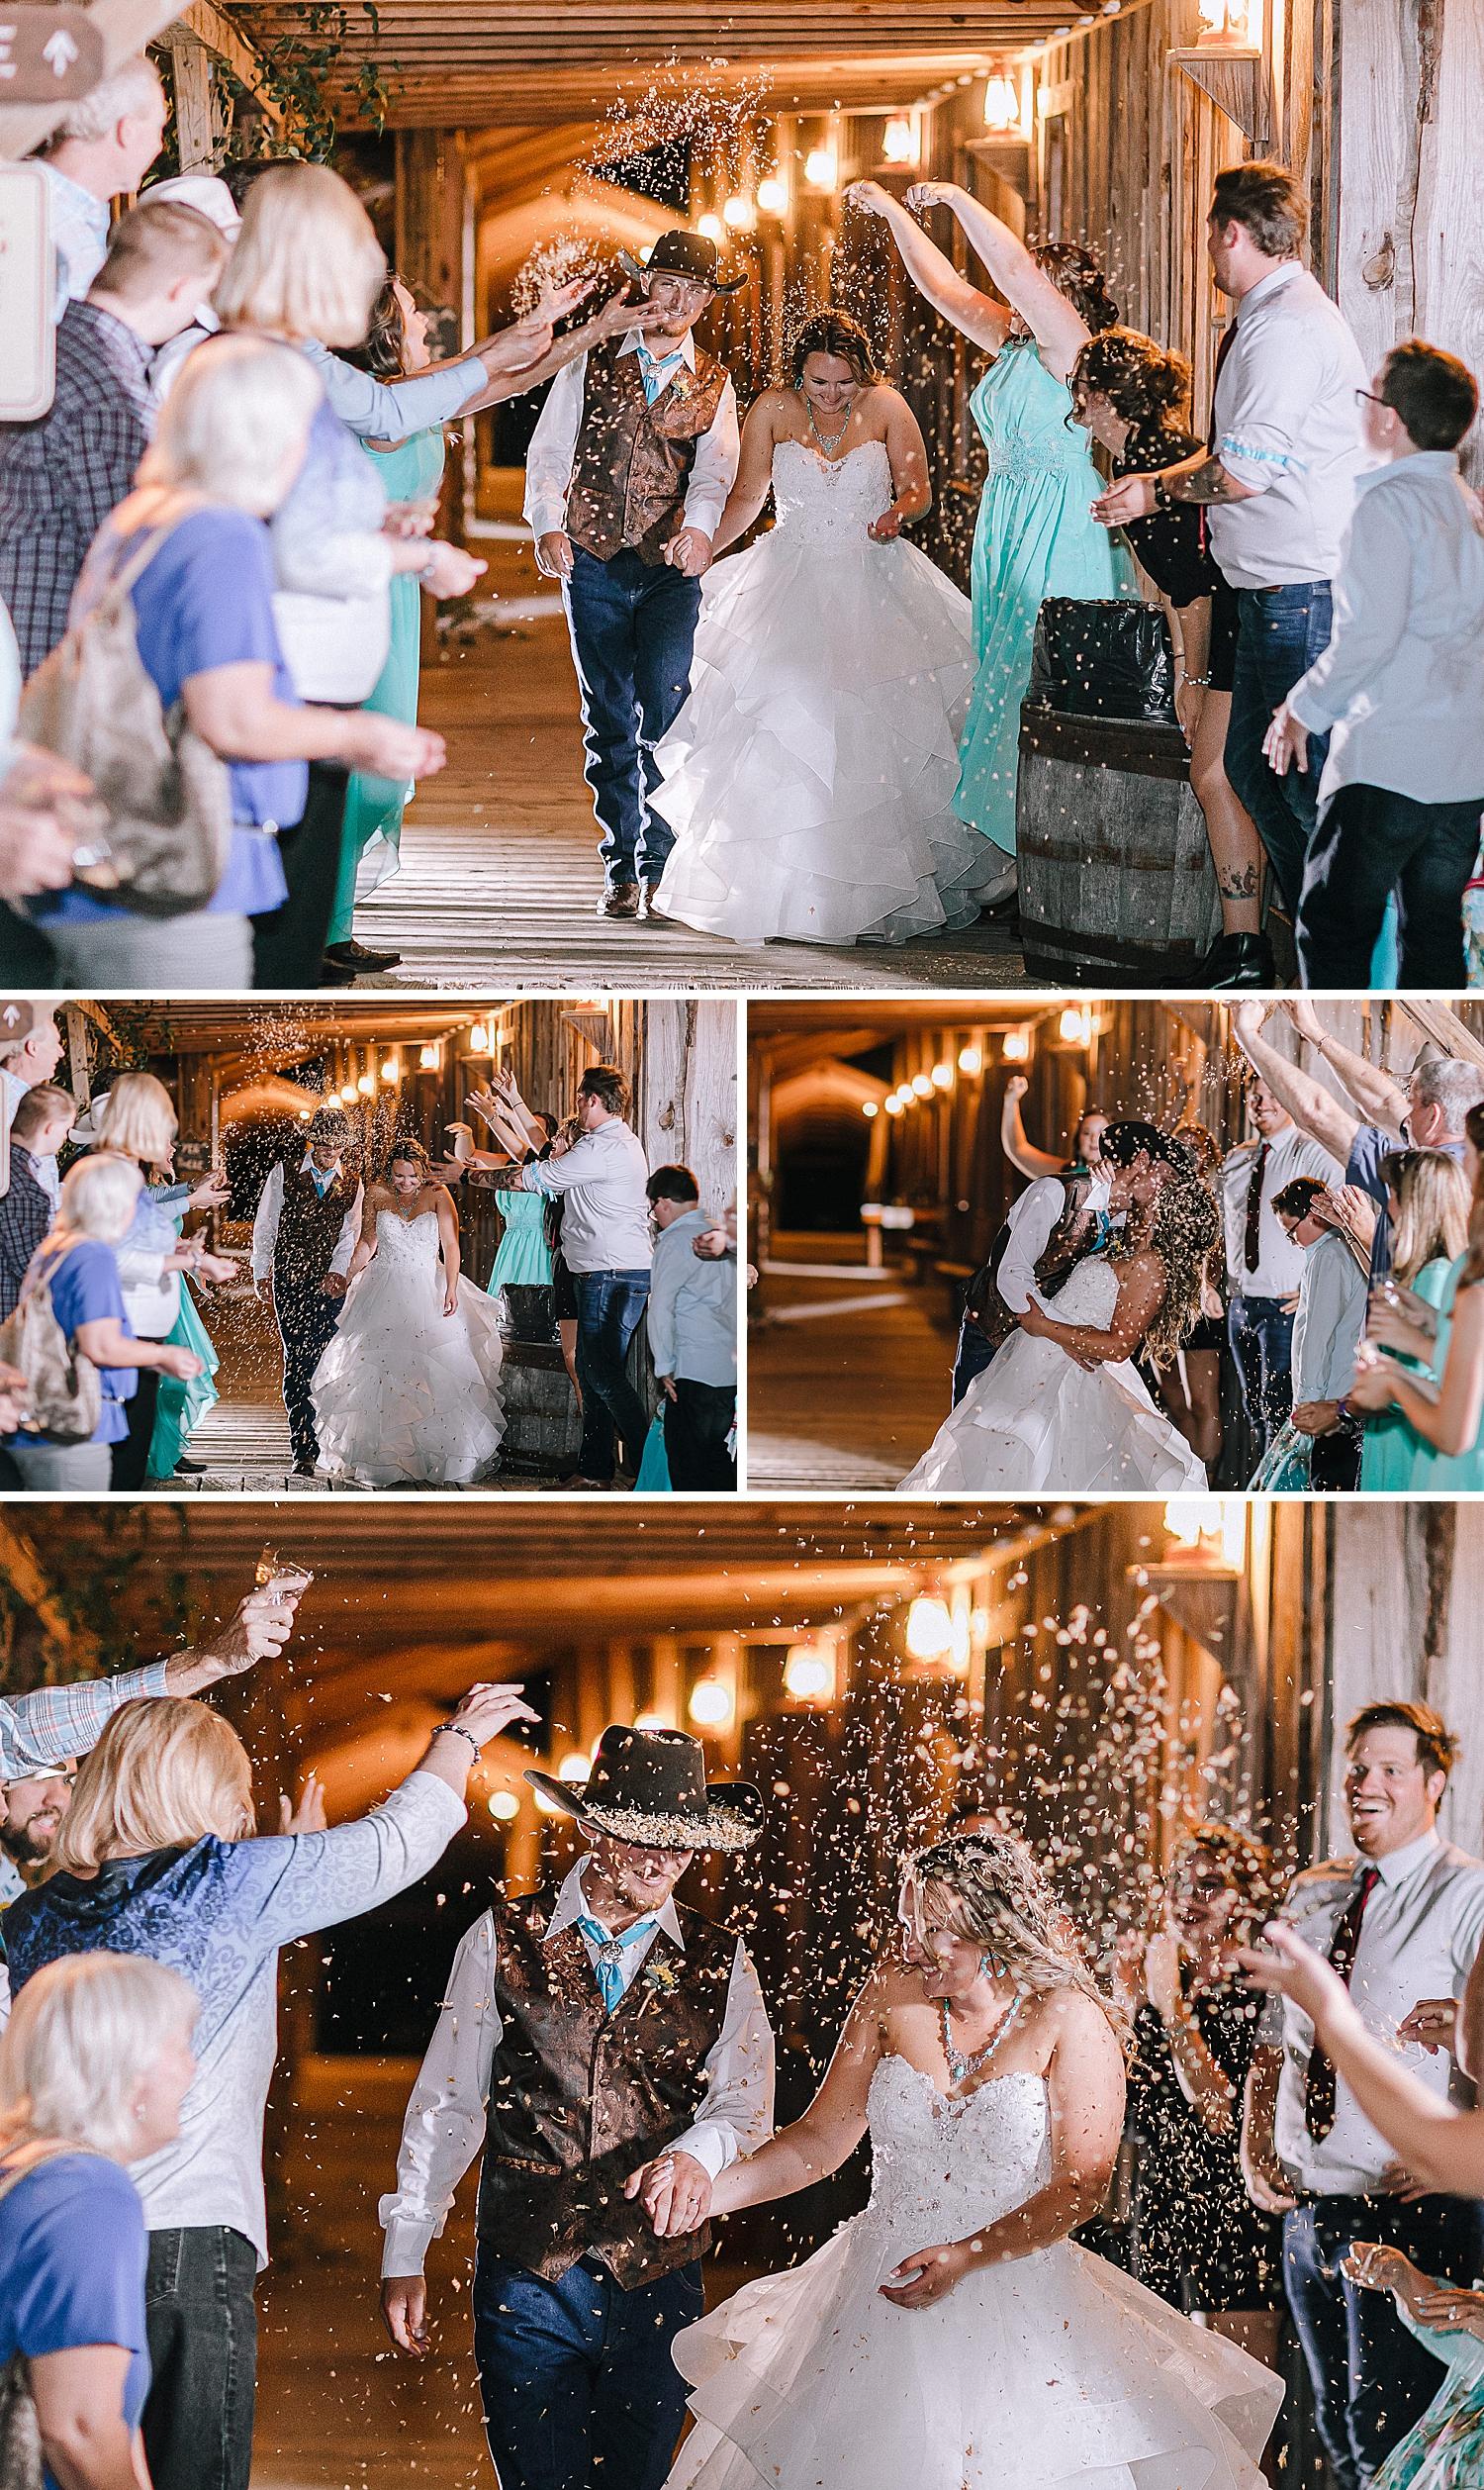 Carly-Barton-Photography-Old-Town-Texas-Rustic-Wedding-Photos-Sunflowers-Boots-Kyle-Texas_0096.jpg